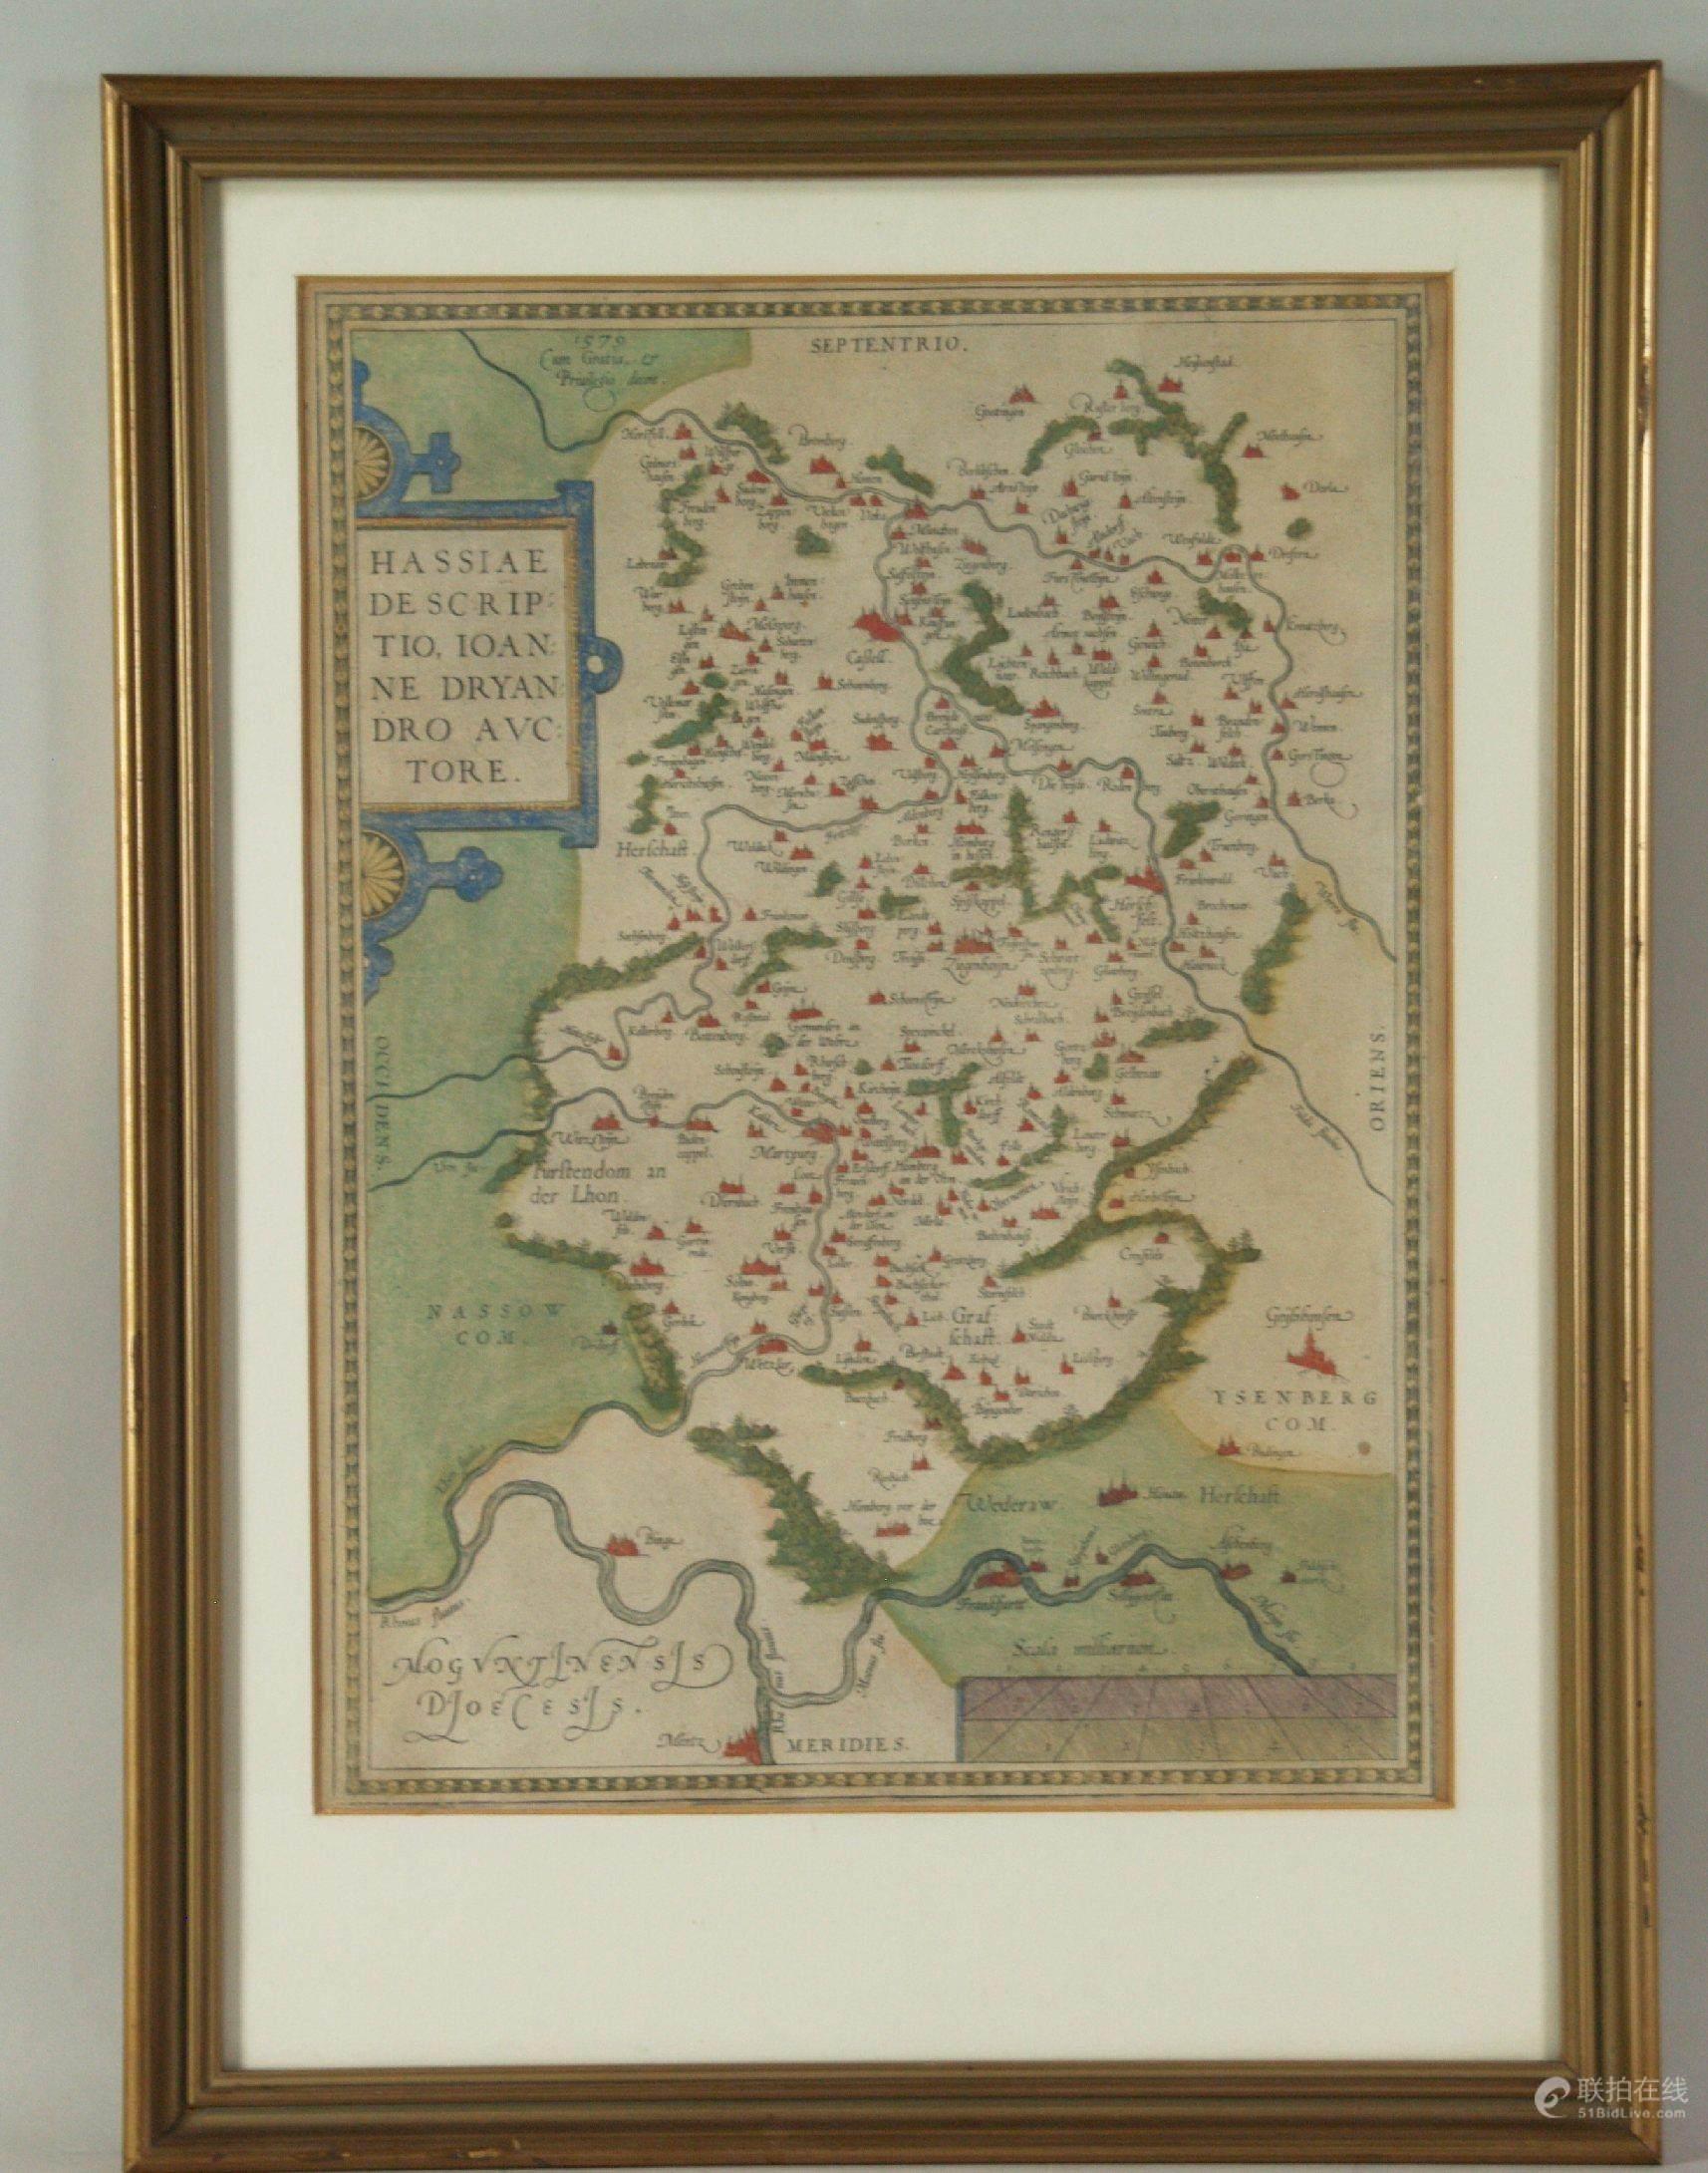 51BidLive-[Dryander,Johann(1500 Wetter - 1560 Marburg) - Hassiae ...